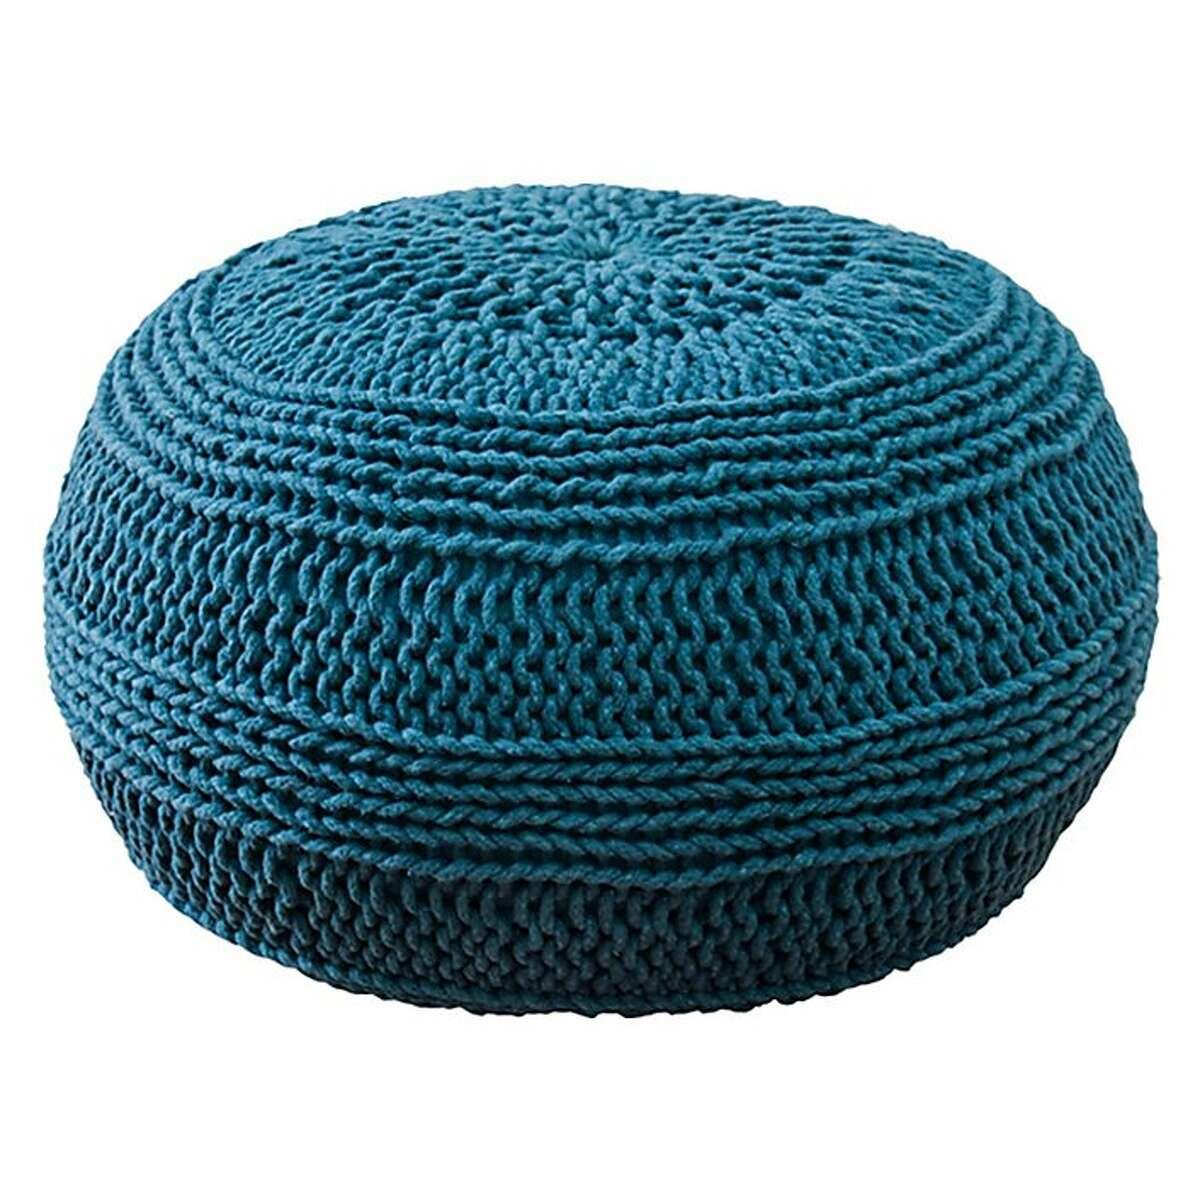 More: $160 Rizzy Home Cable Knit Pouf by Wayfare.